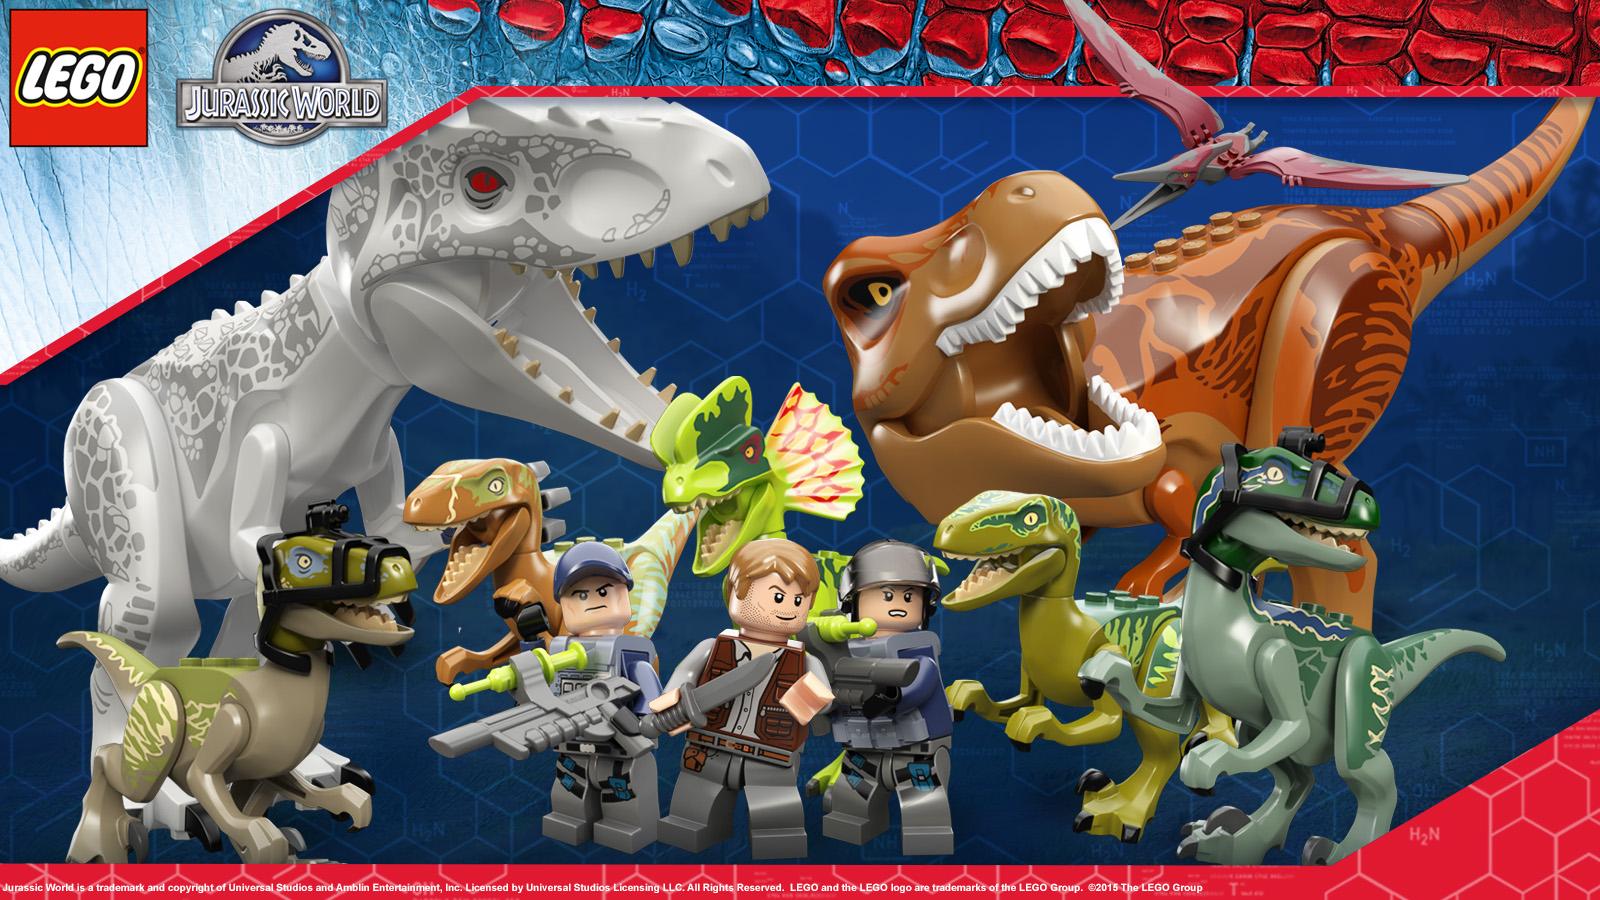 Jurassic World The Game Wallpaper